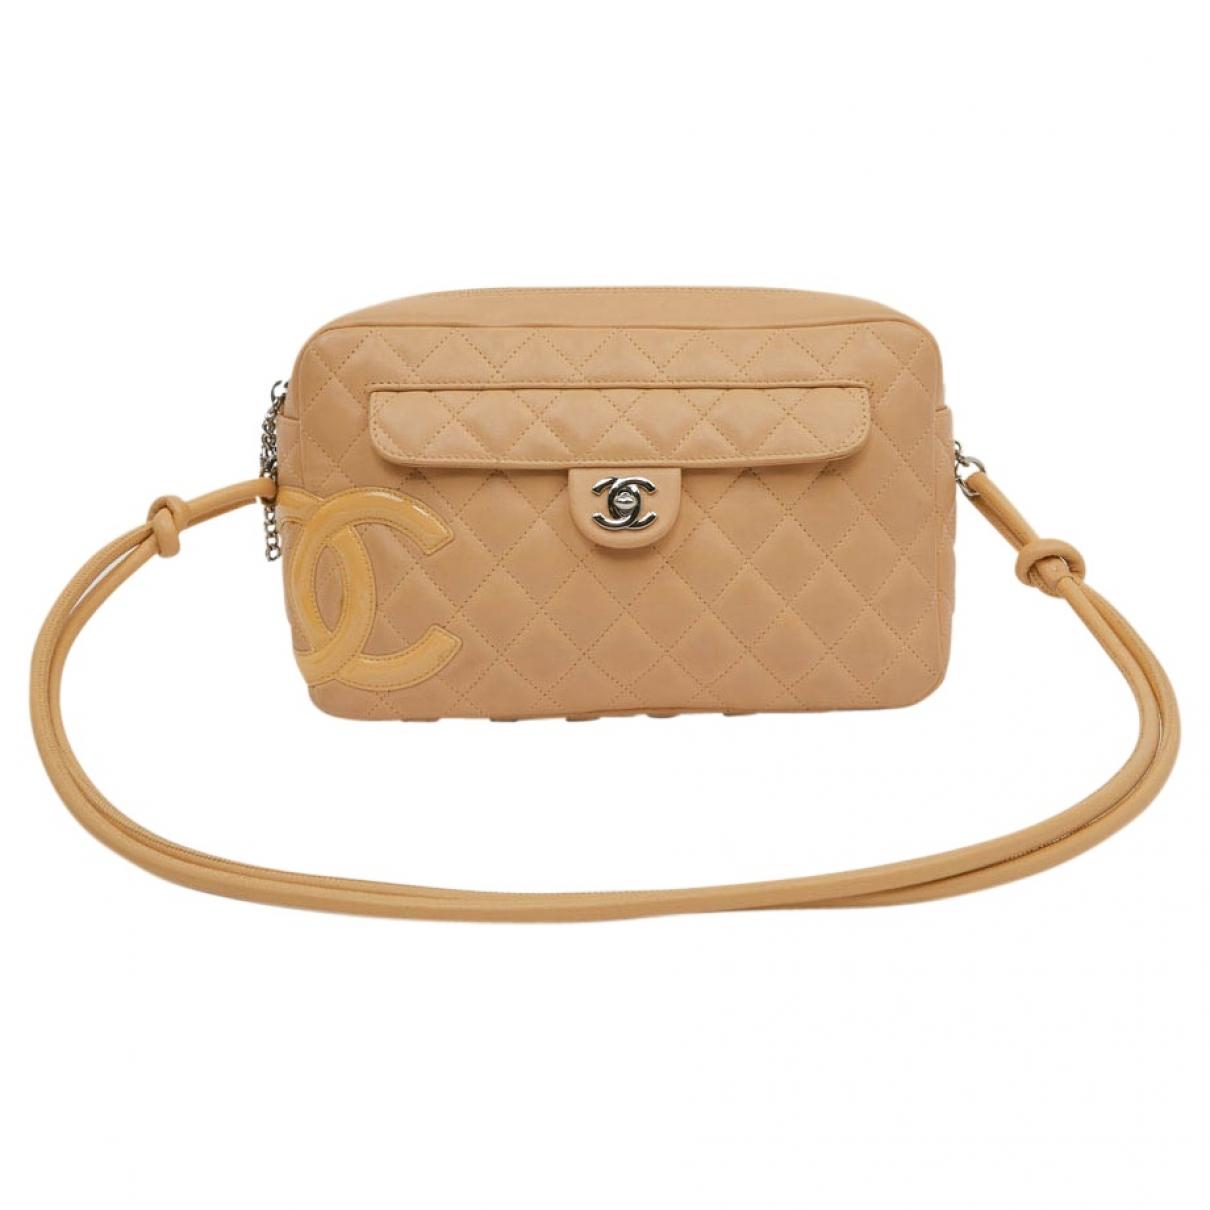 Chanel Cambon Beige Leather handbag for Women \N